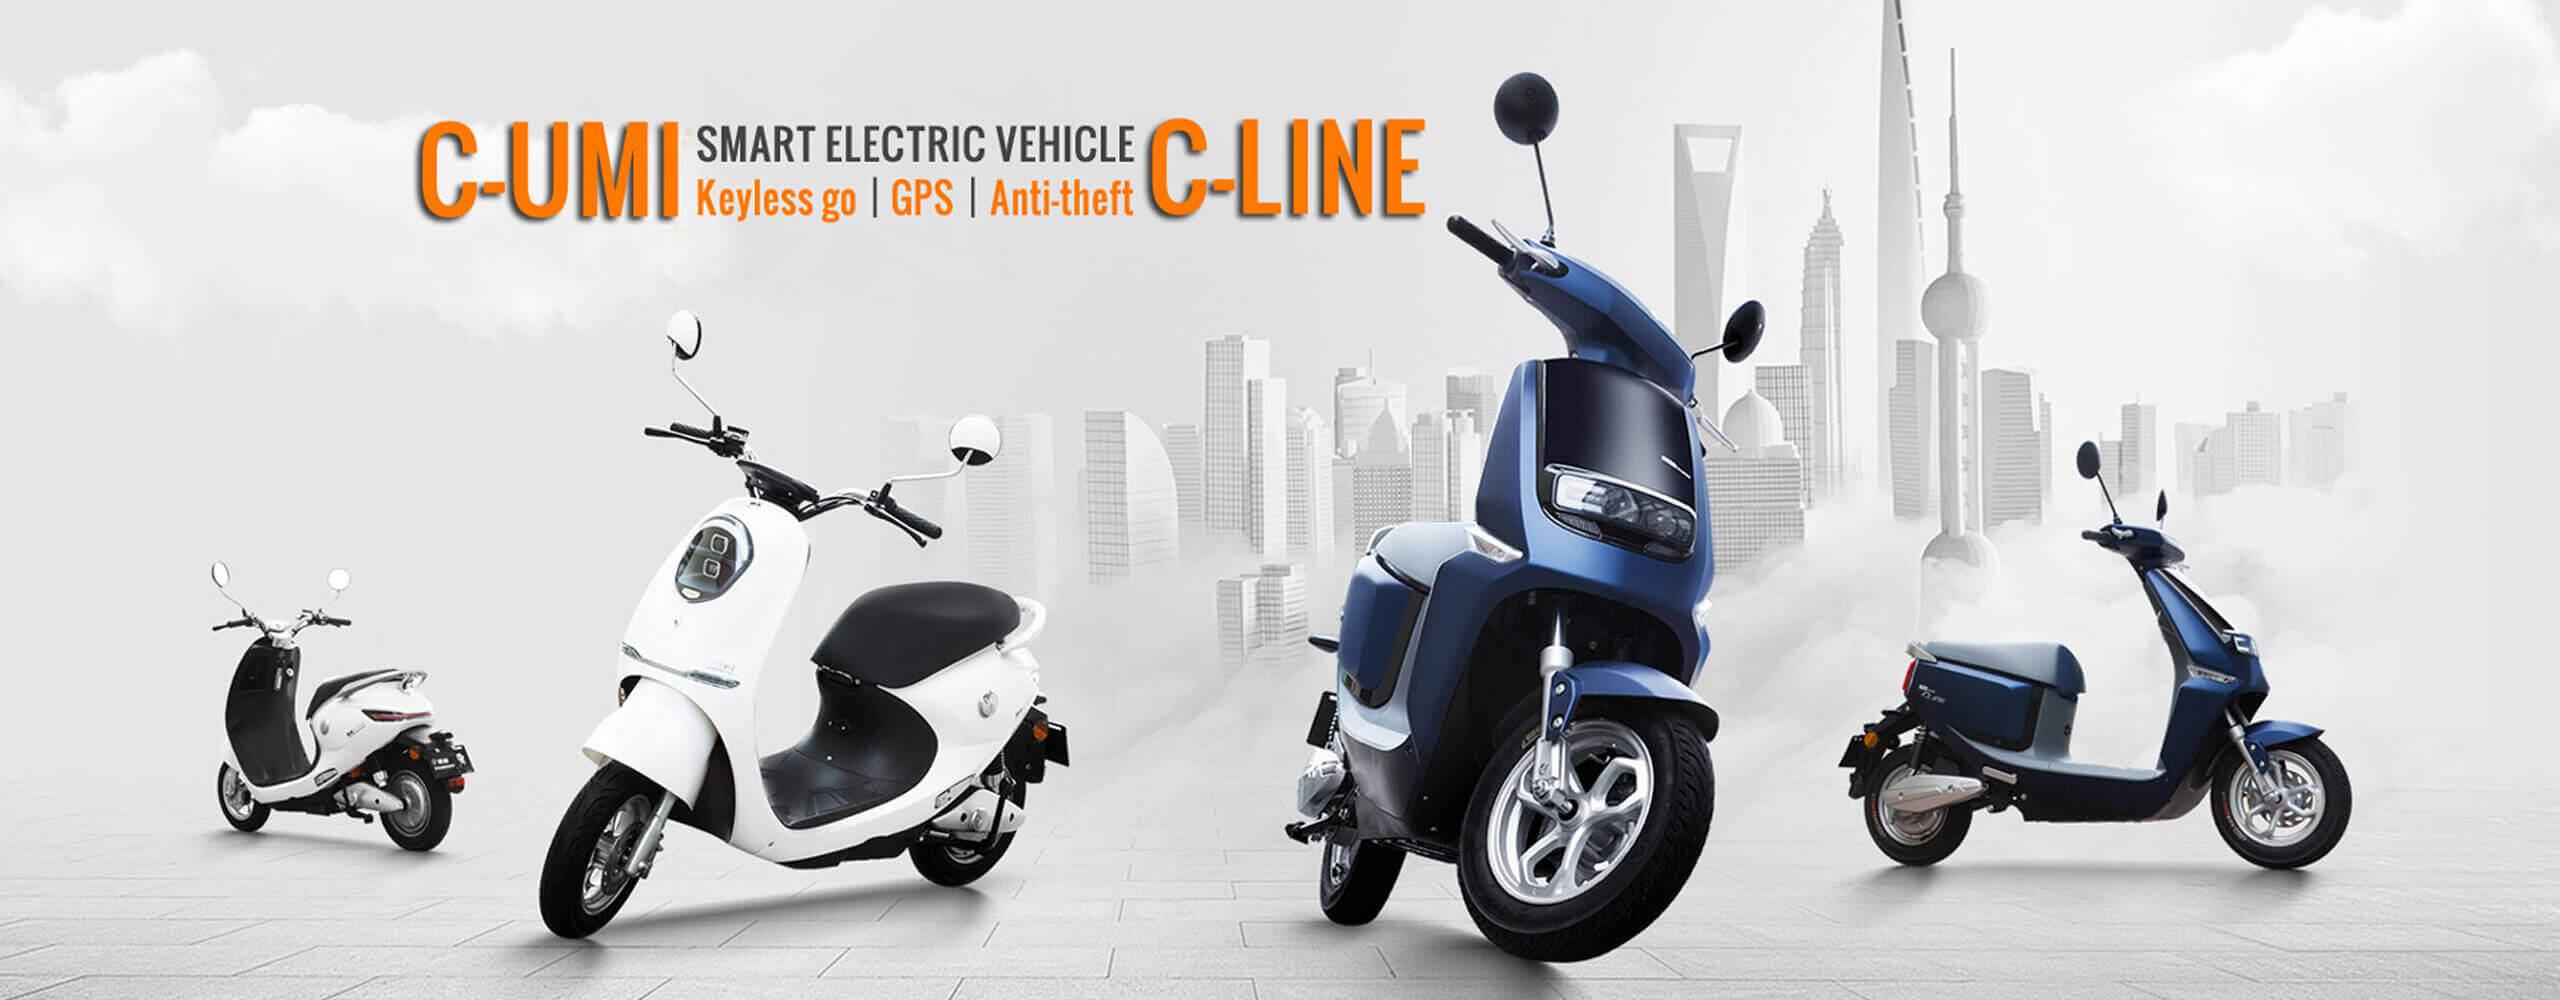 Yadea scooters